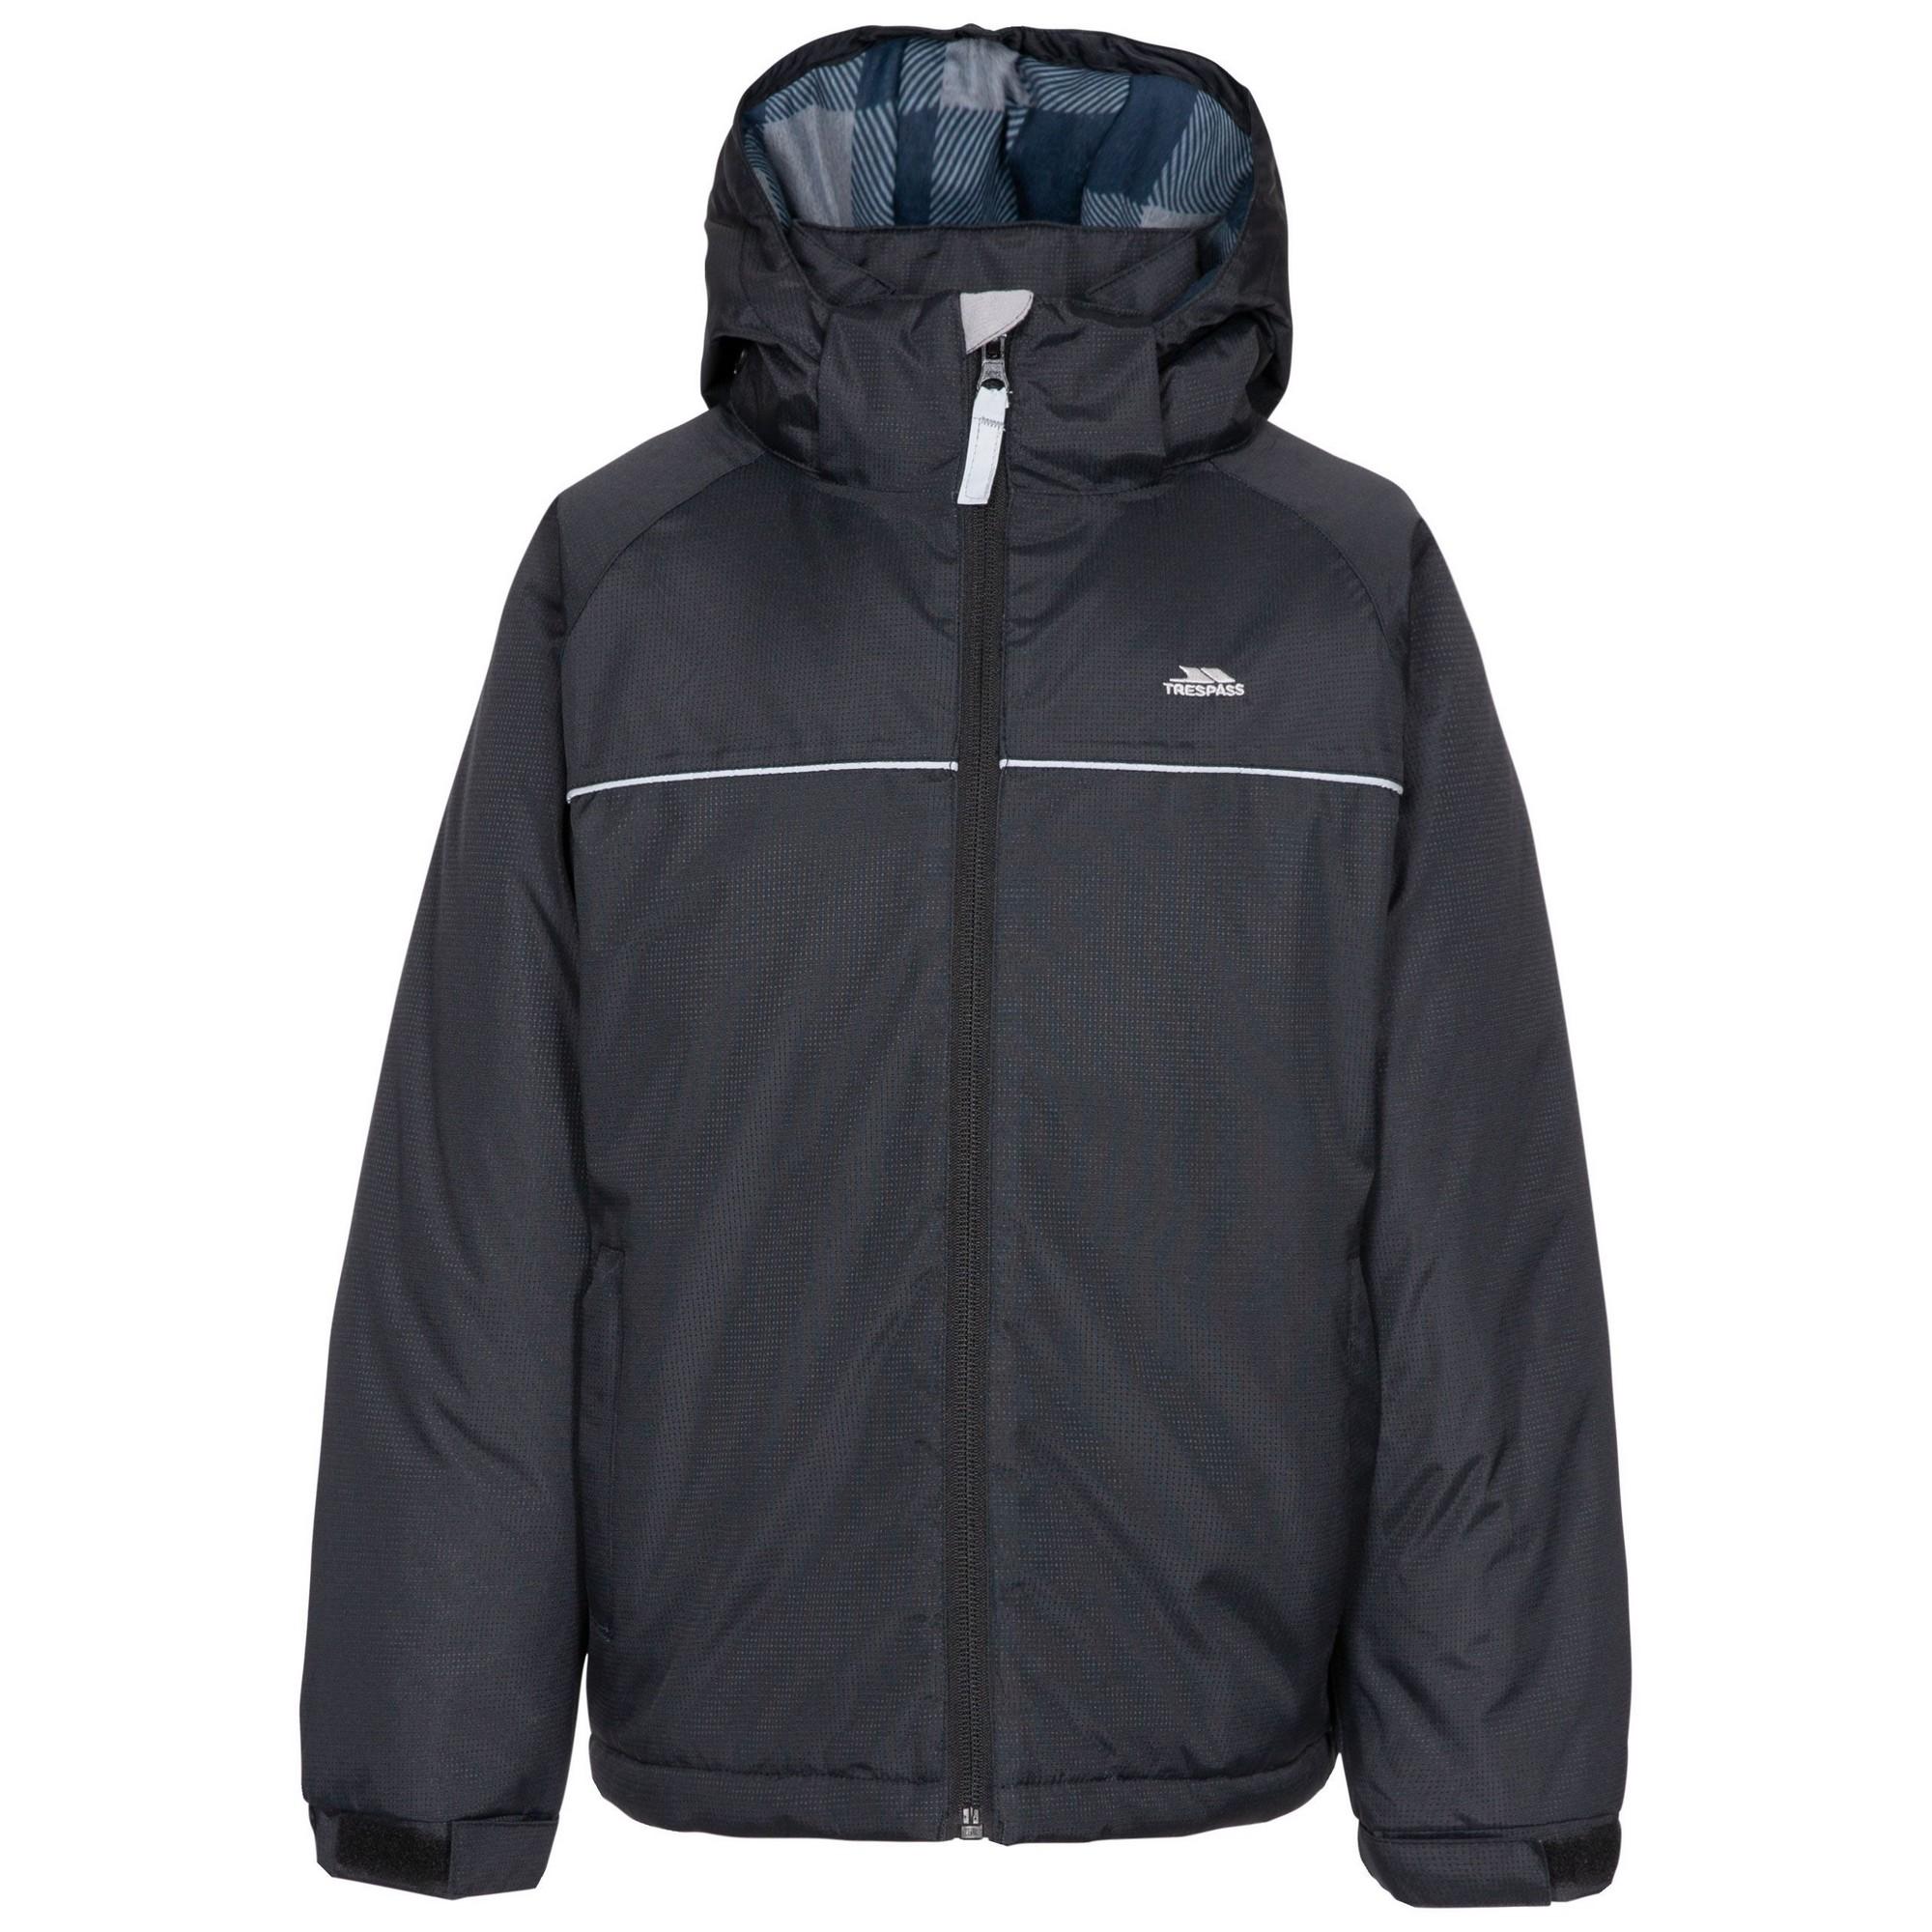 Trespass Boys Upright Padded Jacket (11-12 Years) (Black)